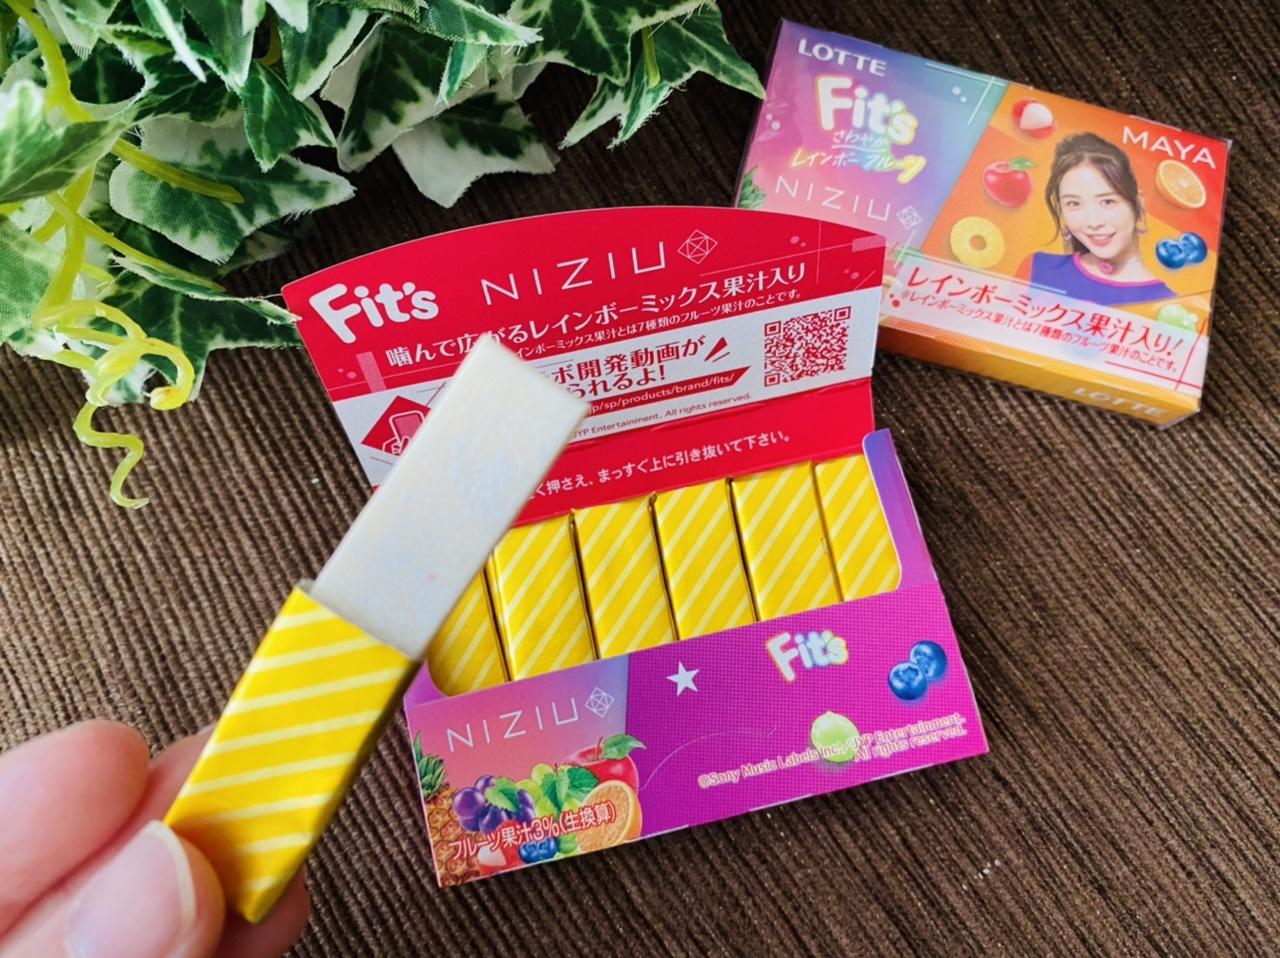 【NiziU× Fit's】パケ買い必至★全メンバー揃えたい!《コラボガム》が可愛すぎ♡_2